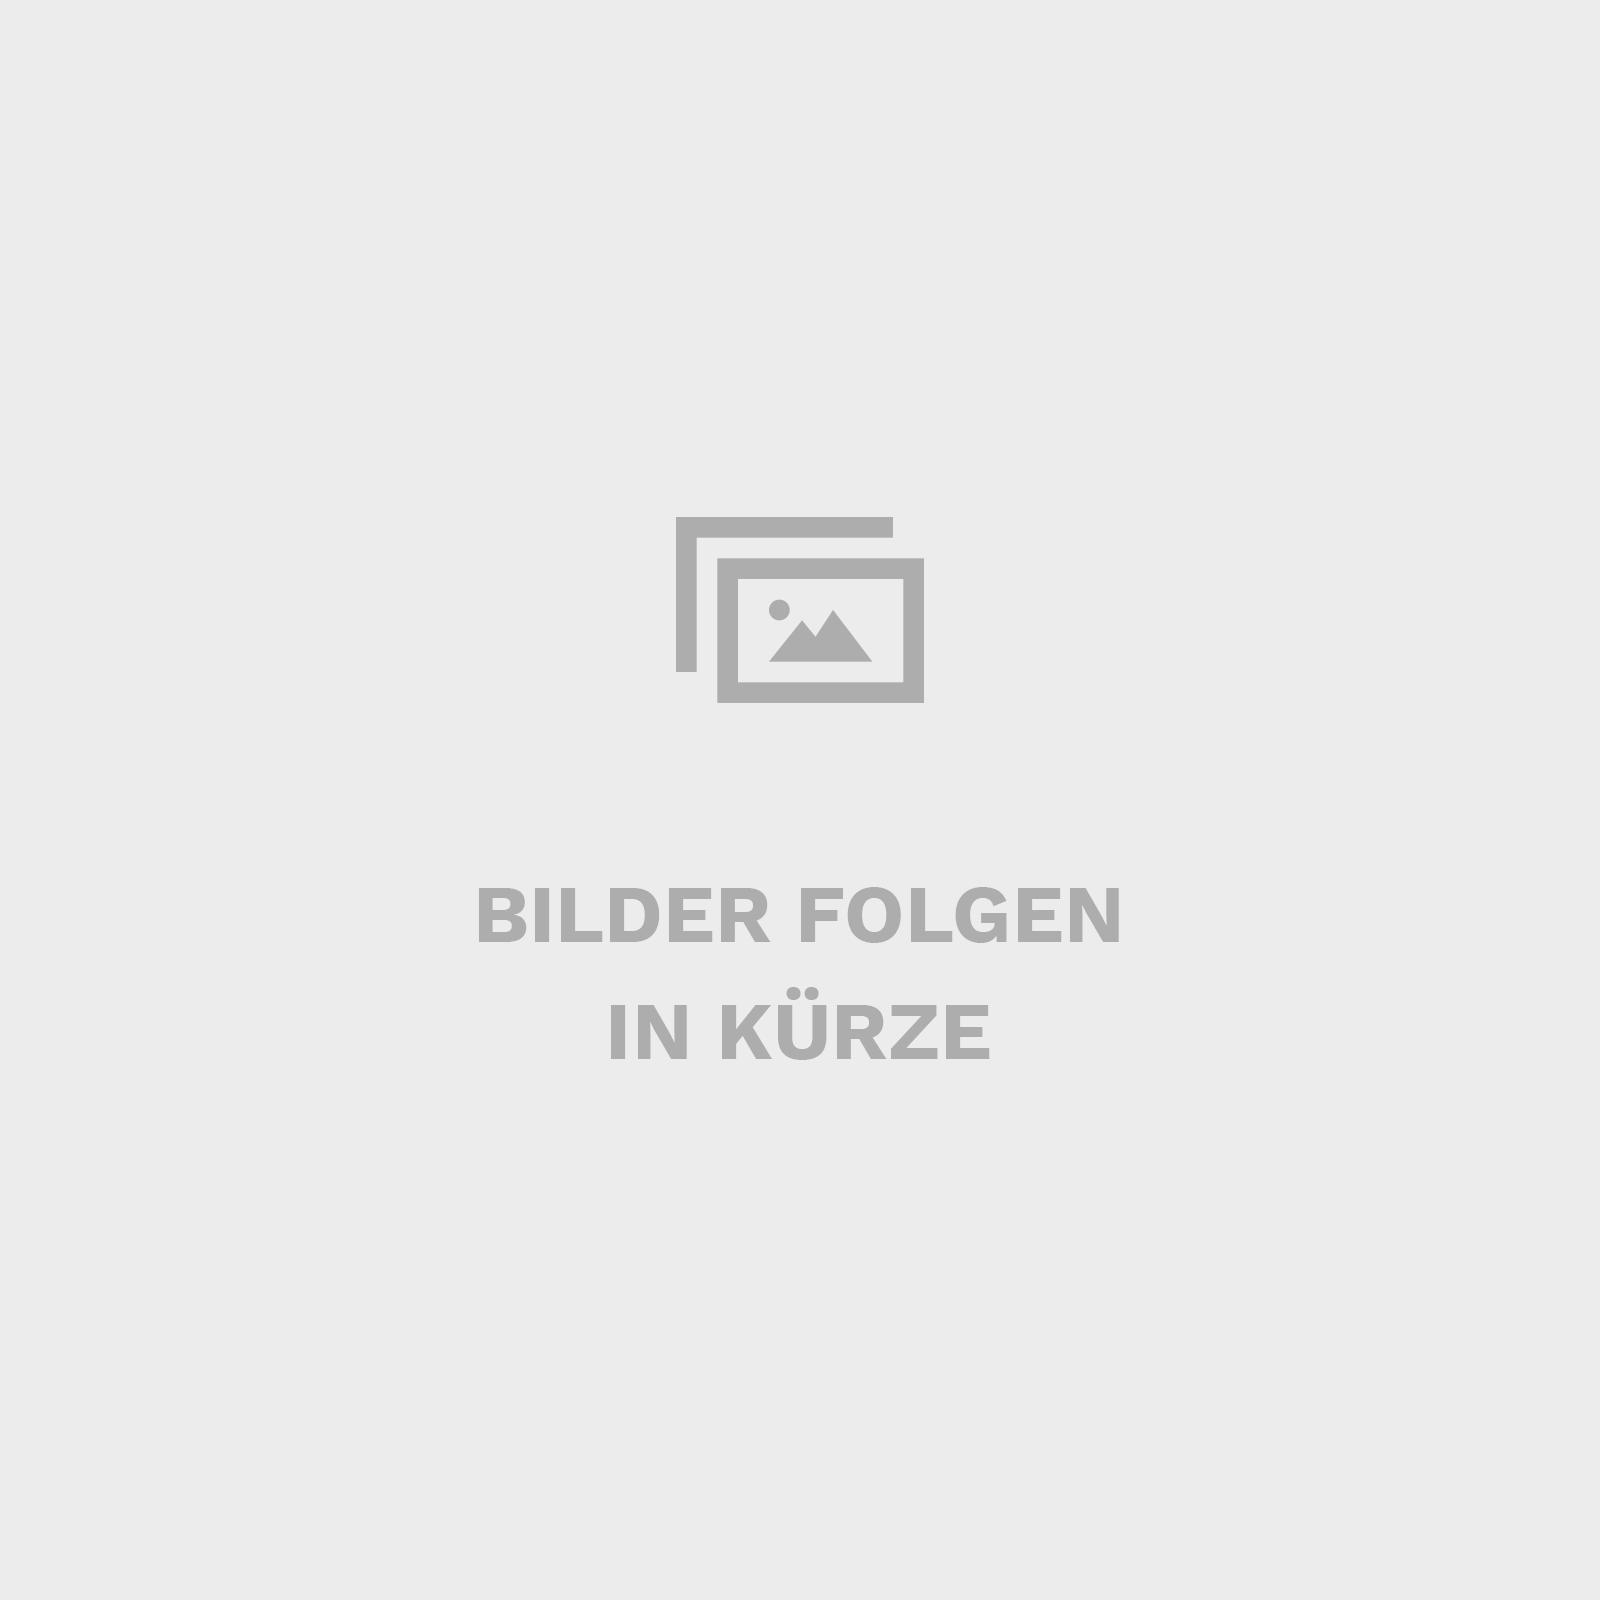 Kvadrat Rugs - Duotone - Farbe 0931 - Detailansicht